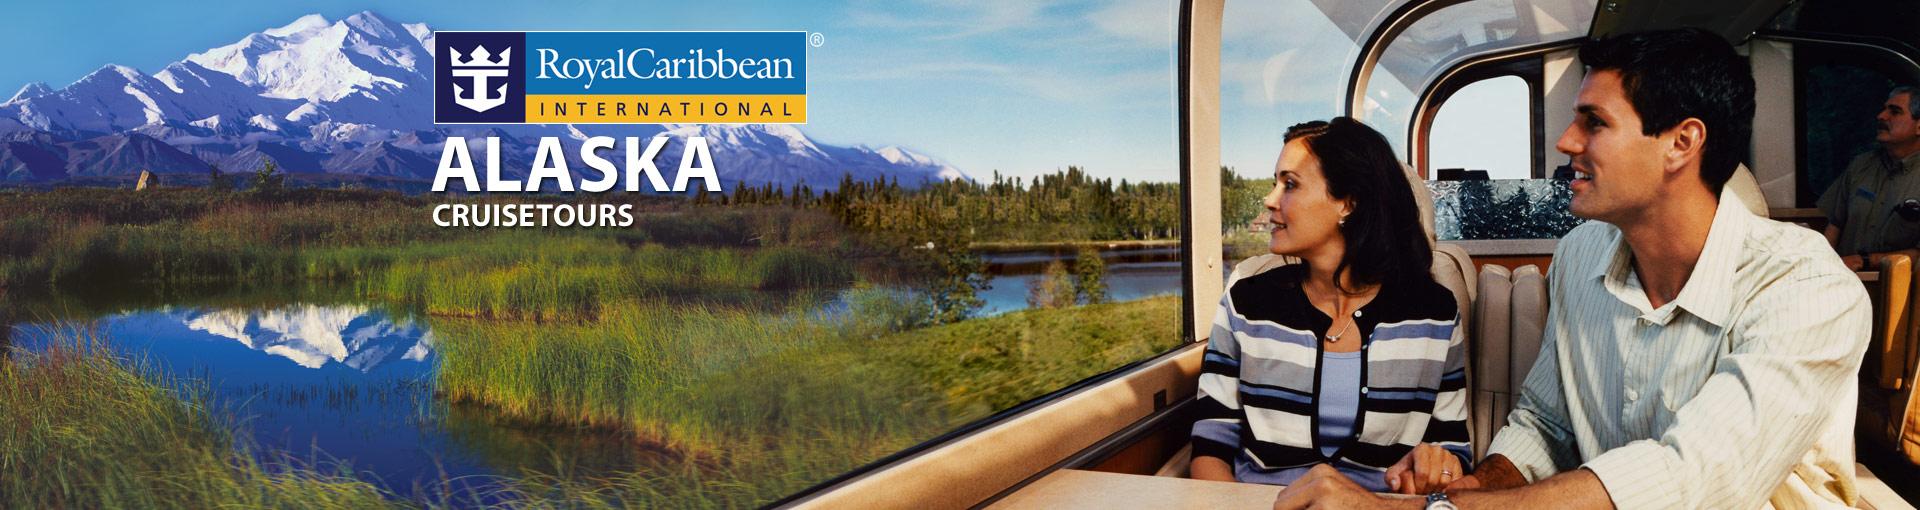 Royal Caribbean Alaska Cruisetours